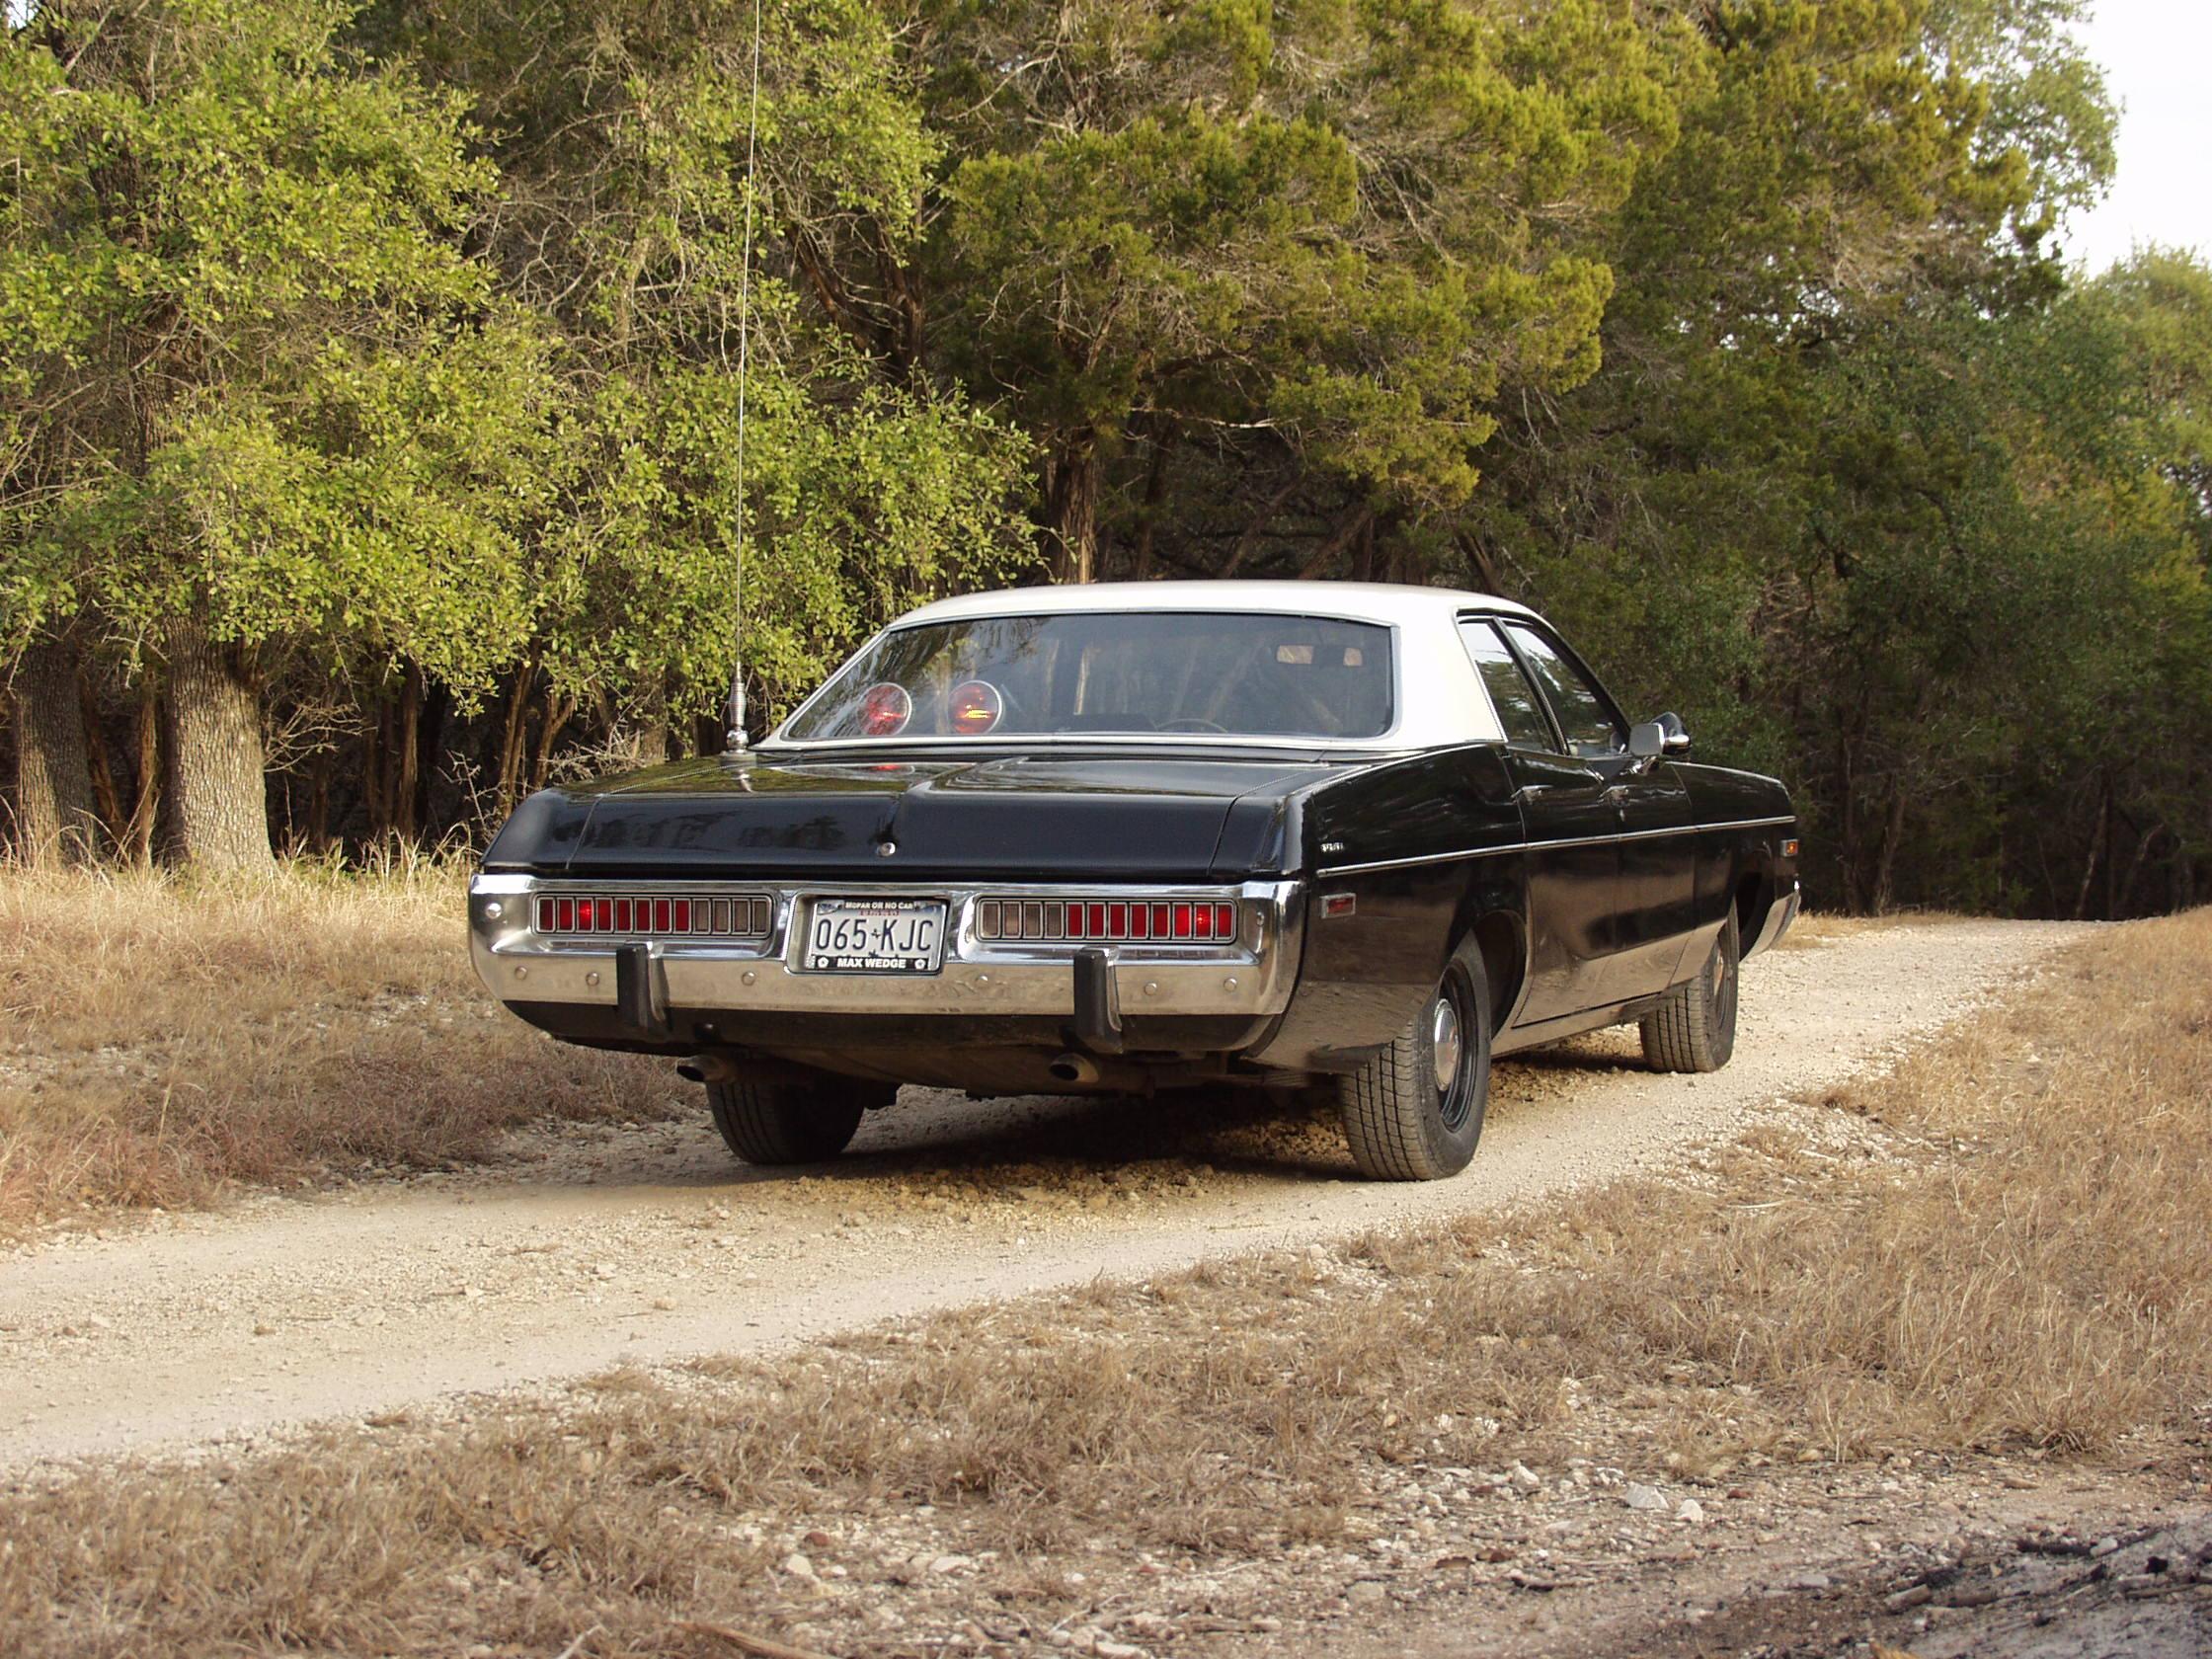 Ponch - David Kumhyr's 1973 Dodge Polara California Highway